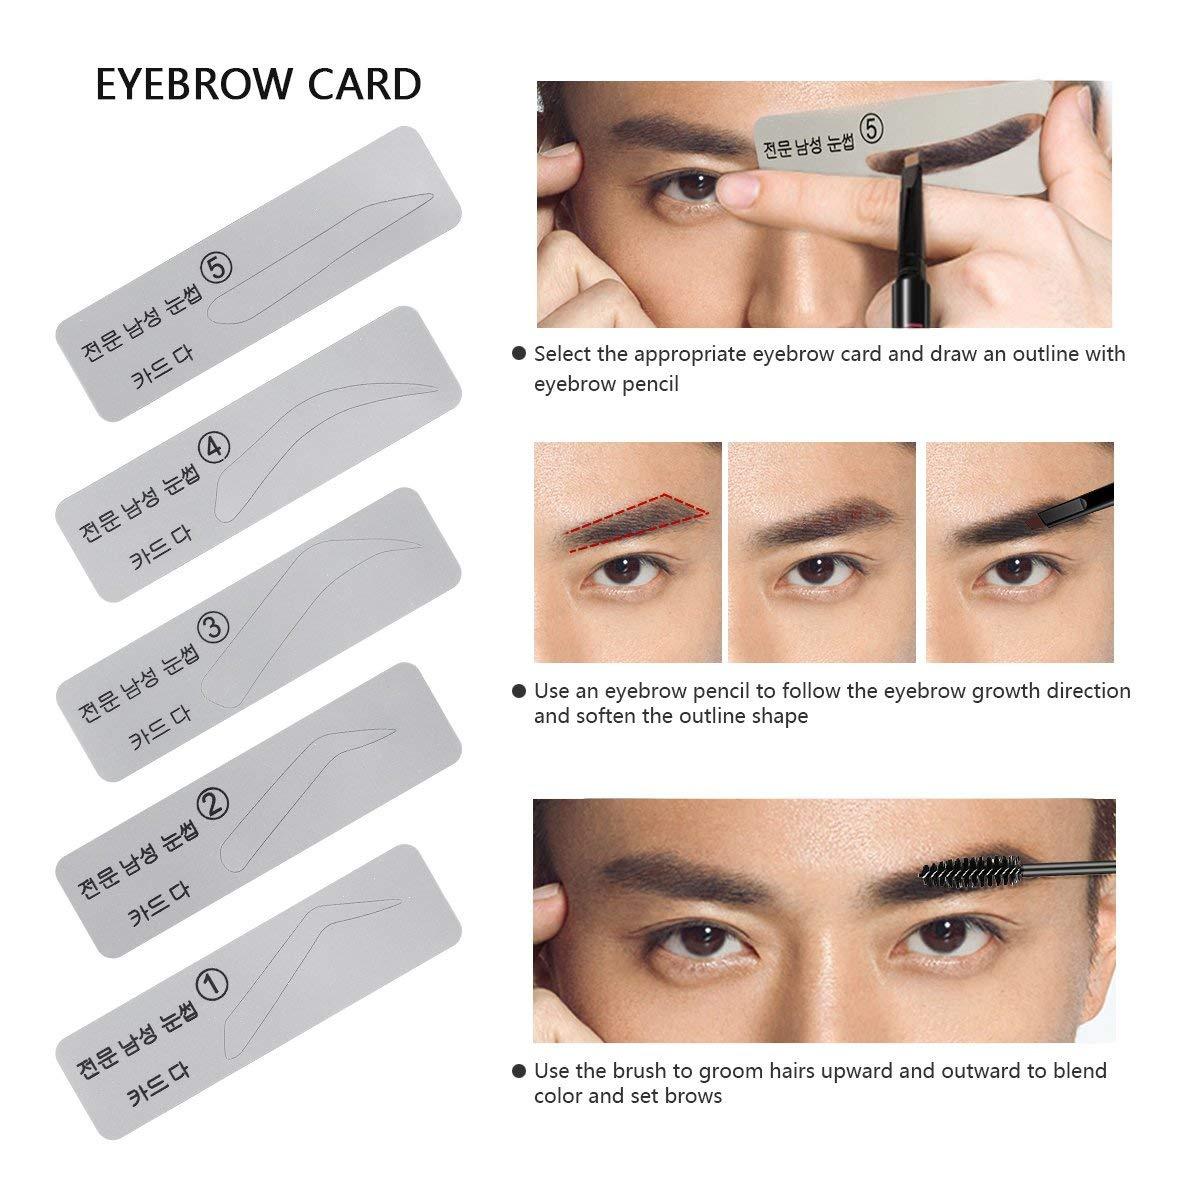 29ba2c2dec00 Eyebrow Kit Razor Pencil Brush Stencil Scissors Tweezers Eyebrow Kit with  Mirror for Men and Women